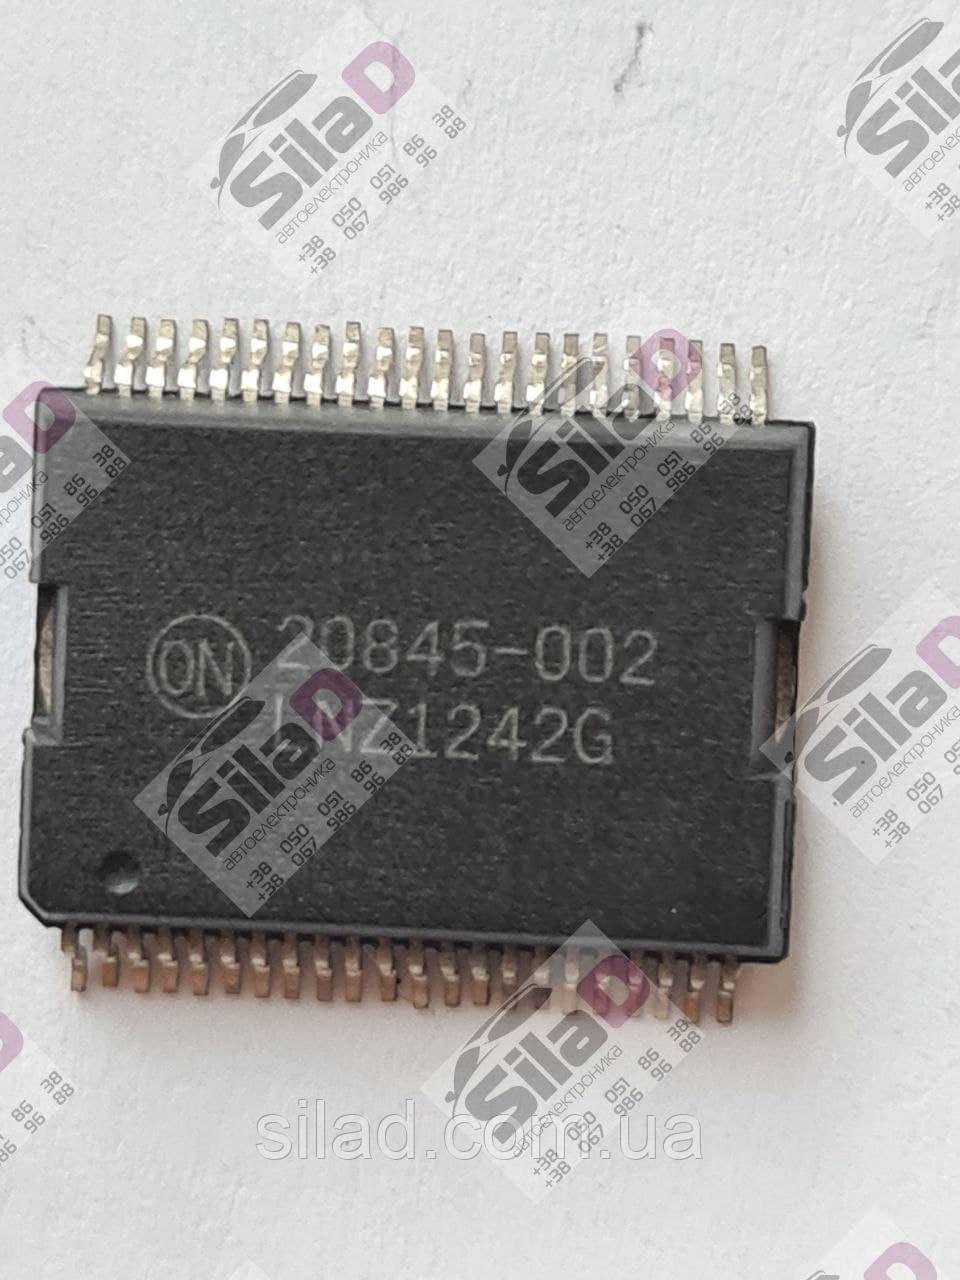 Микросхема 20845-002 On Semiconductor корпус SSOP-44